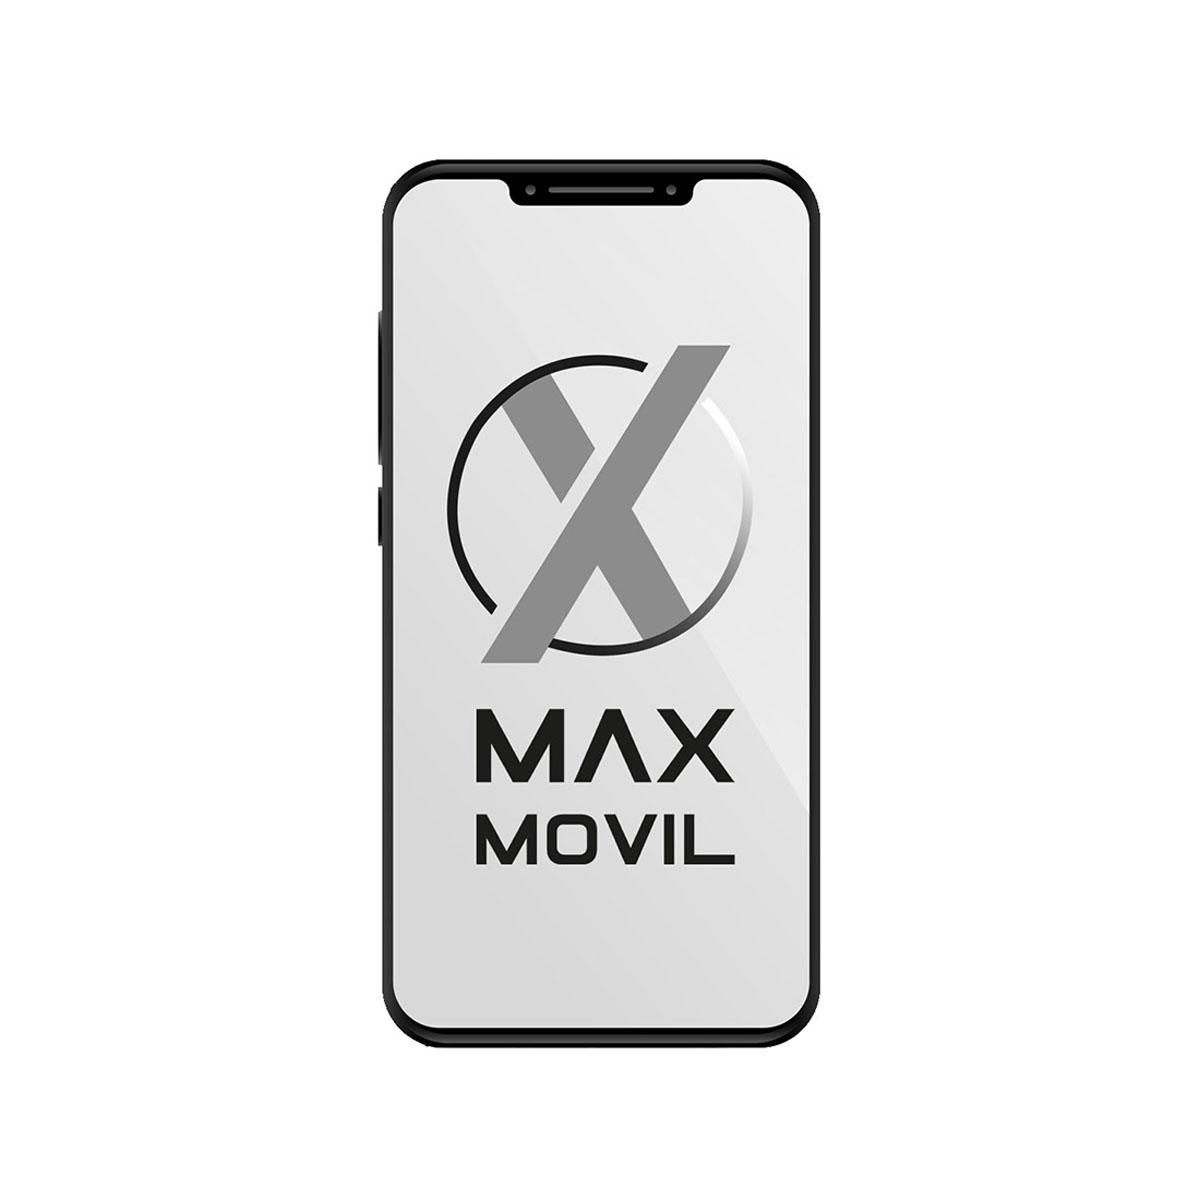 Adaptador HDMI a DVI Audio MJVU2ZM/A